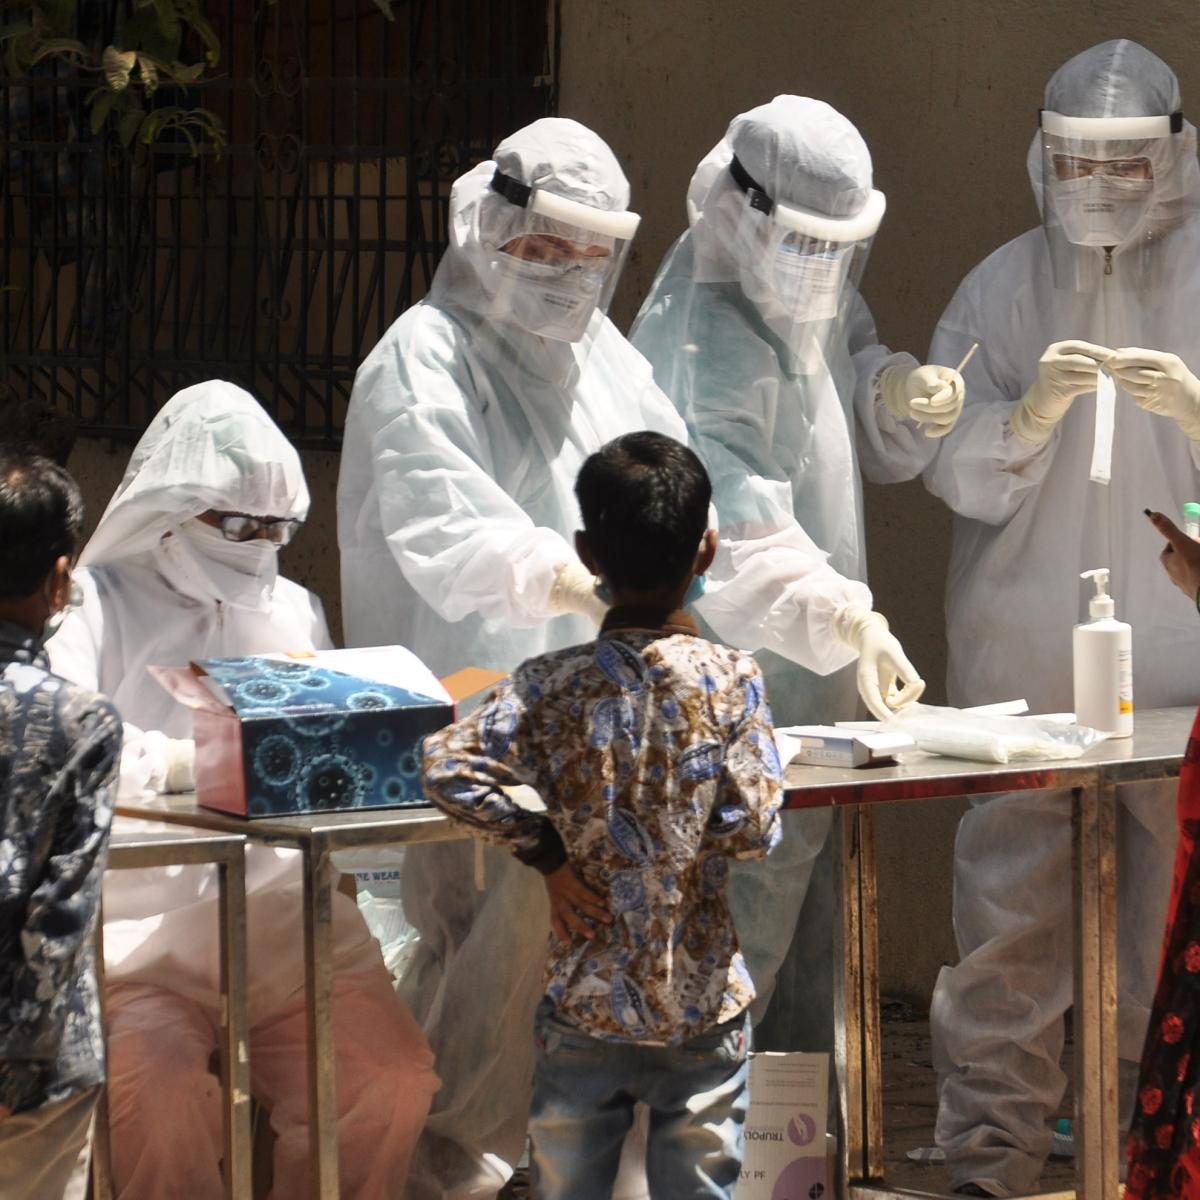 Coronavirus in Navi Mumbai: APMC trader tests COVID-19 positive, fear grips others